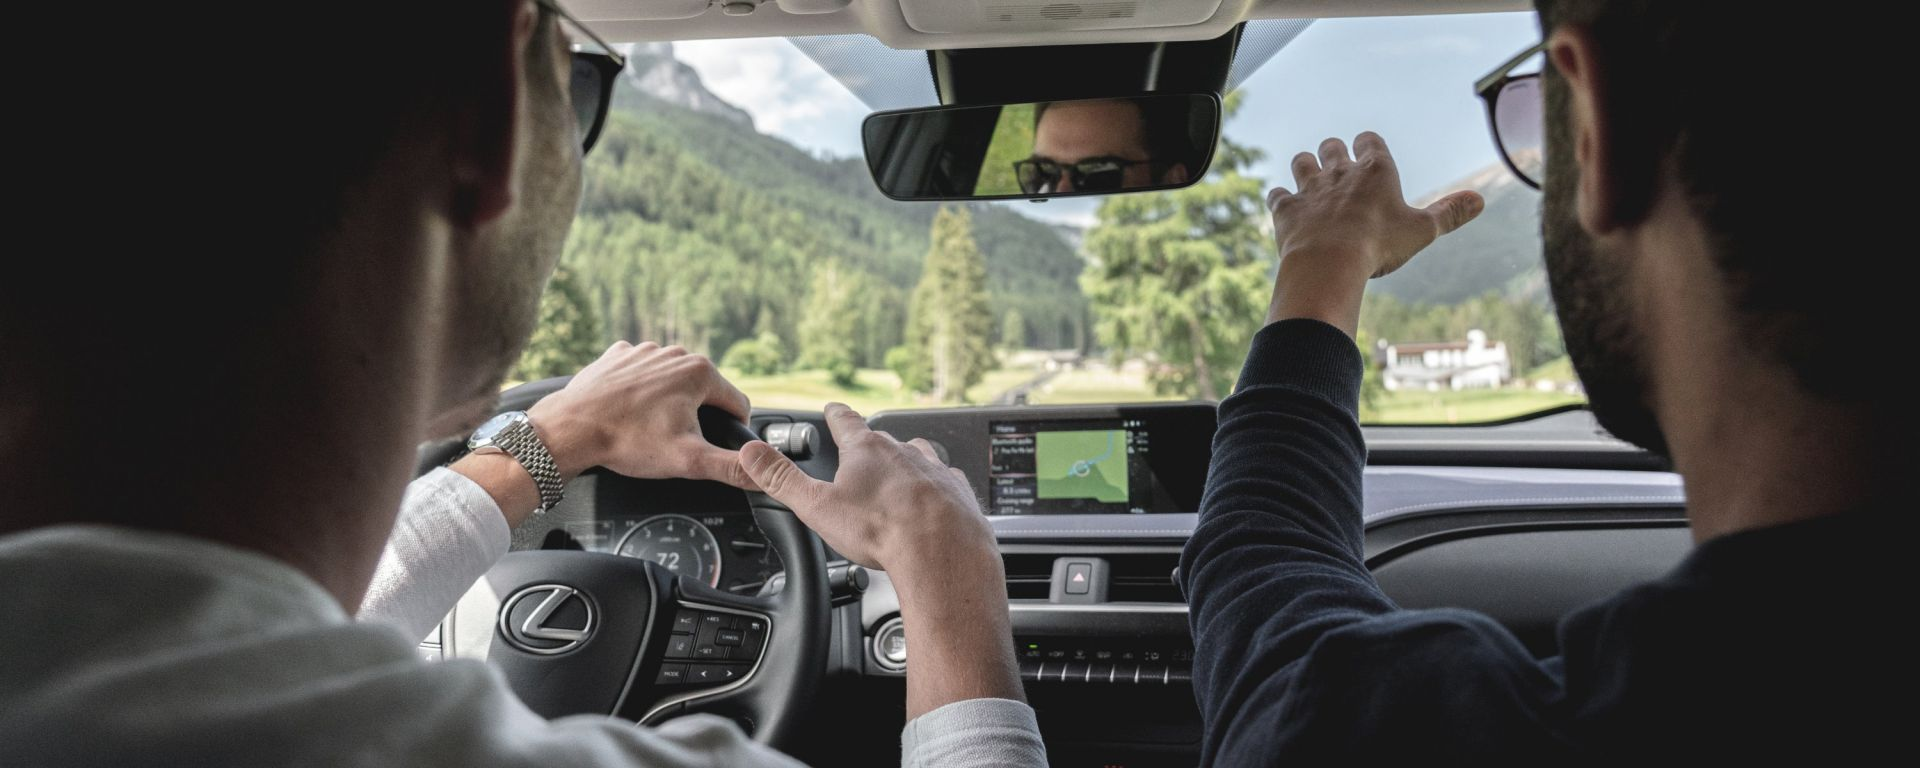 Sondaggio Nokian Tyres sui comportamenti a rischio al volante